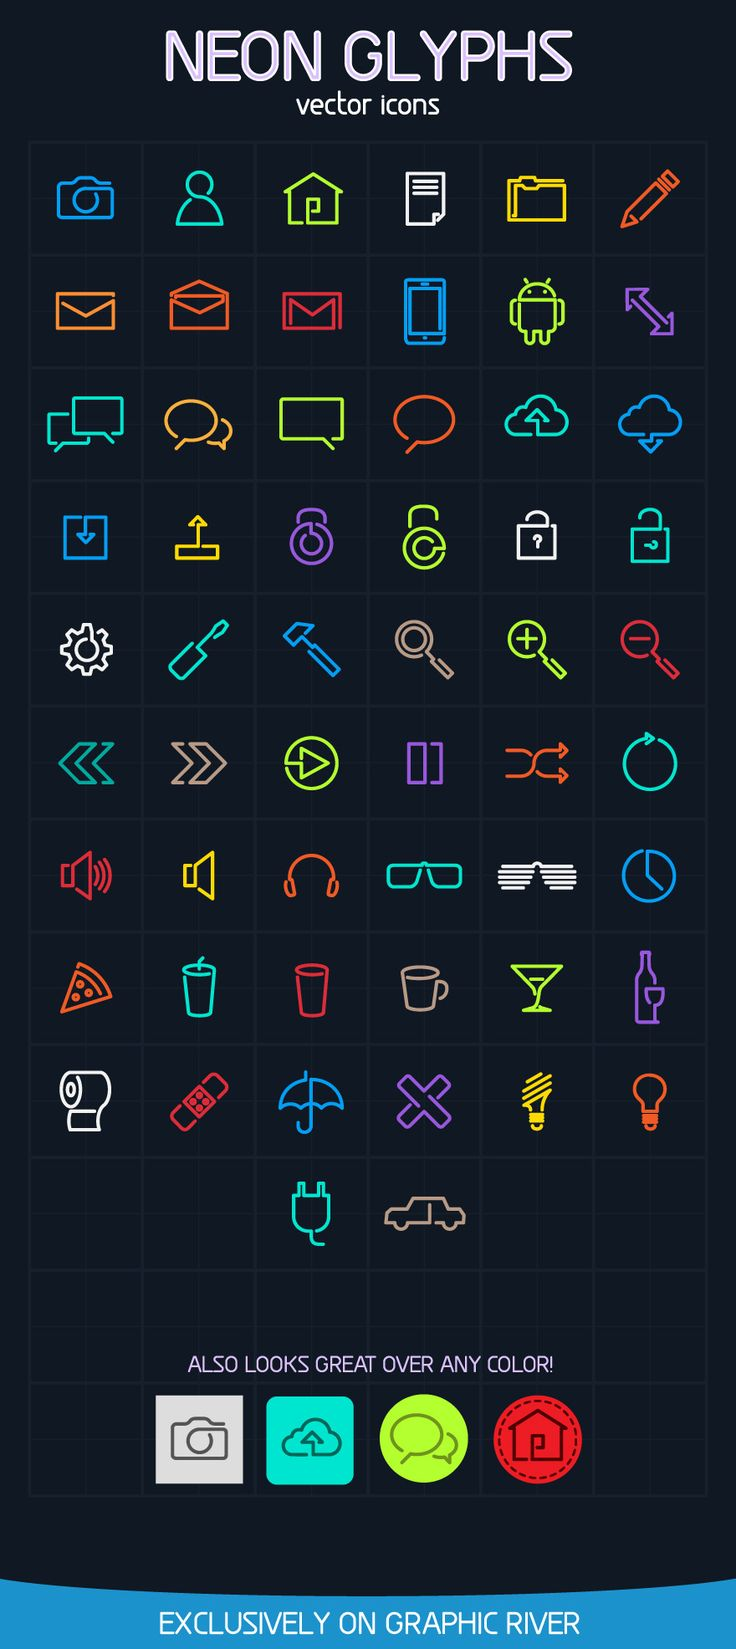 Neon Glyphs Vector Icons - Icon - Creattica